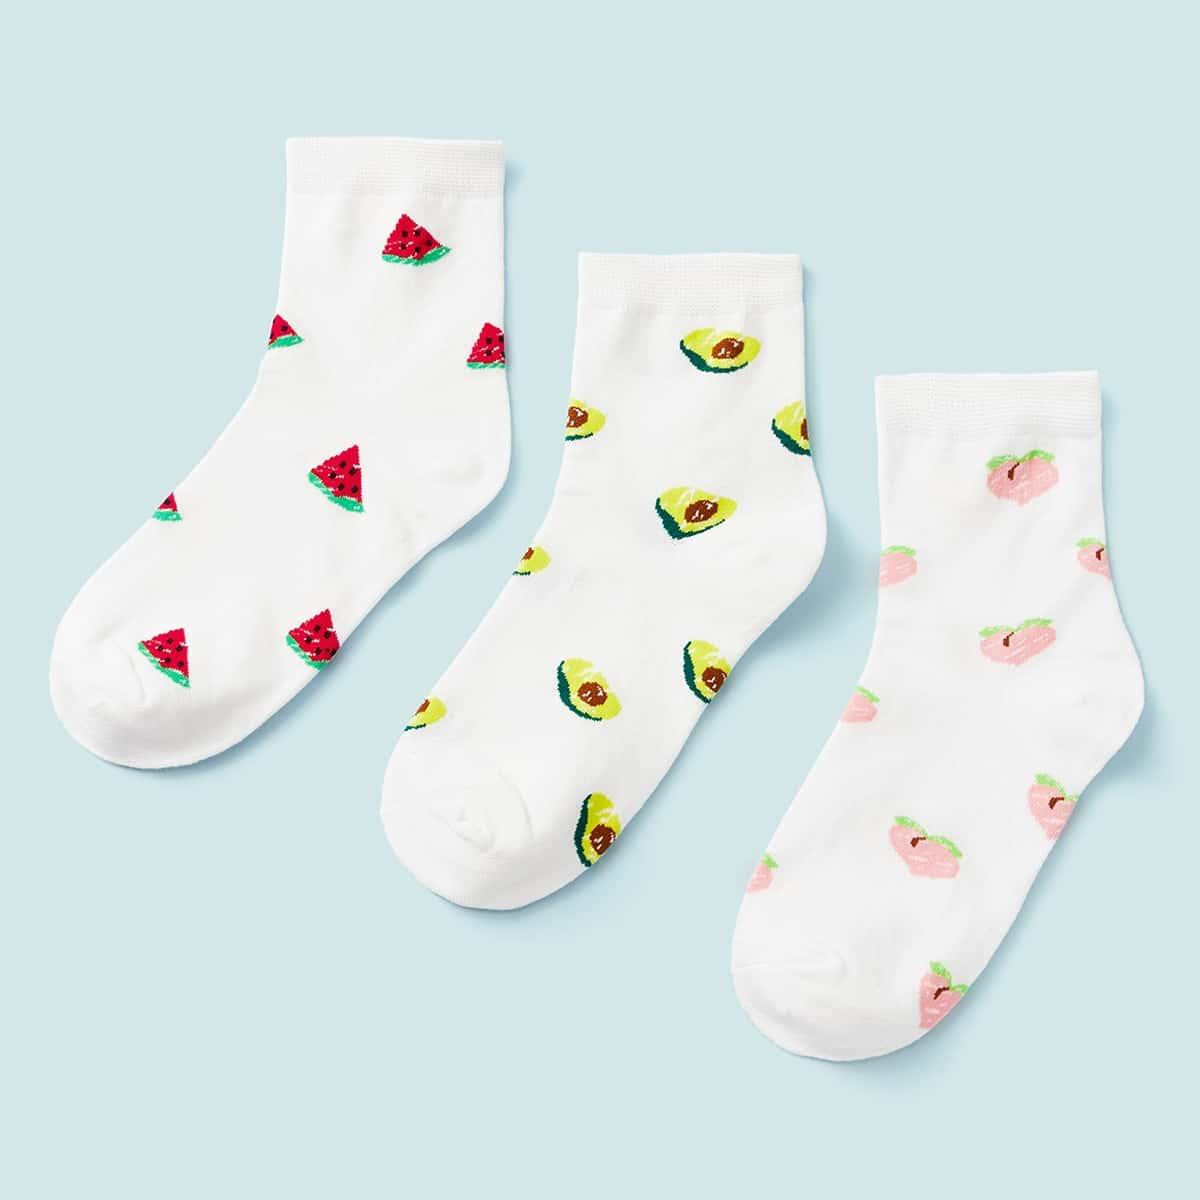 Sokken met watermeloen en perzikpatroon 3 paar